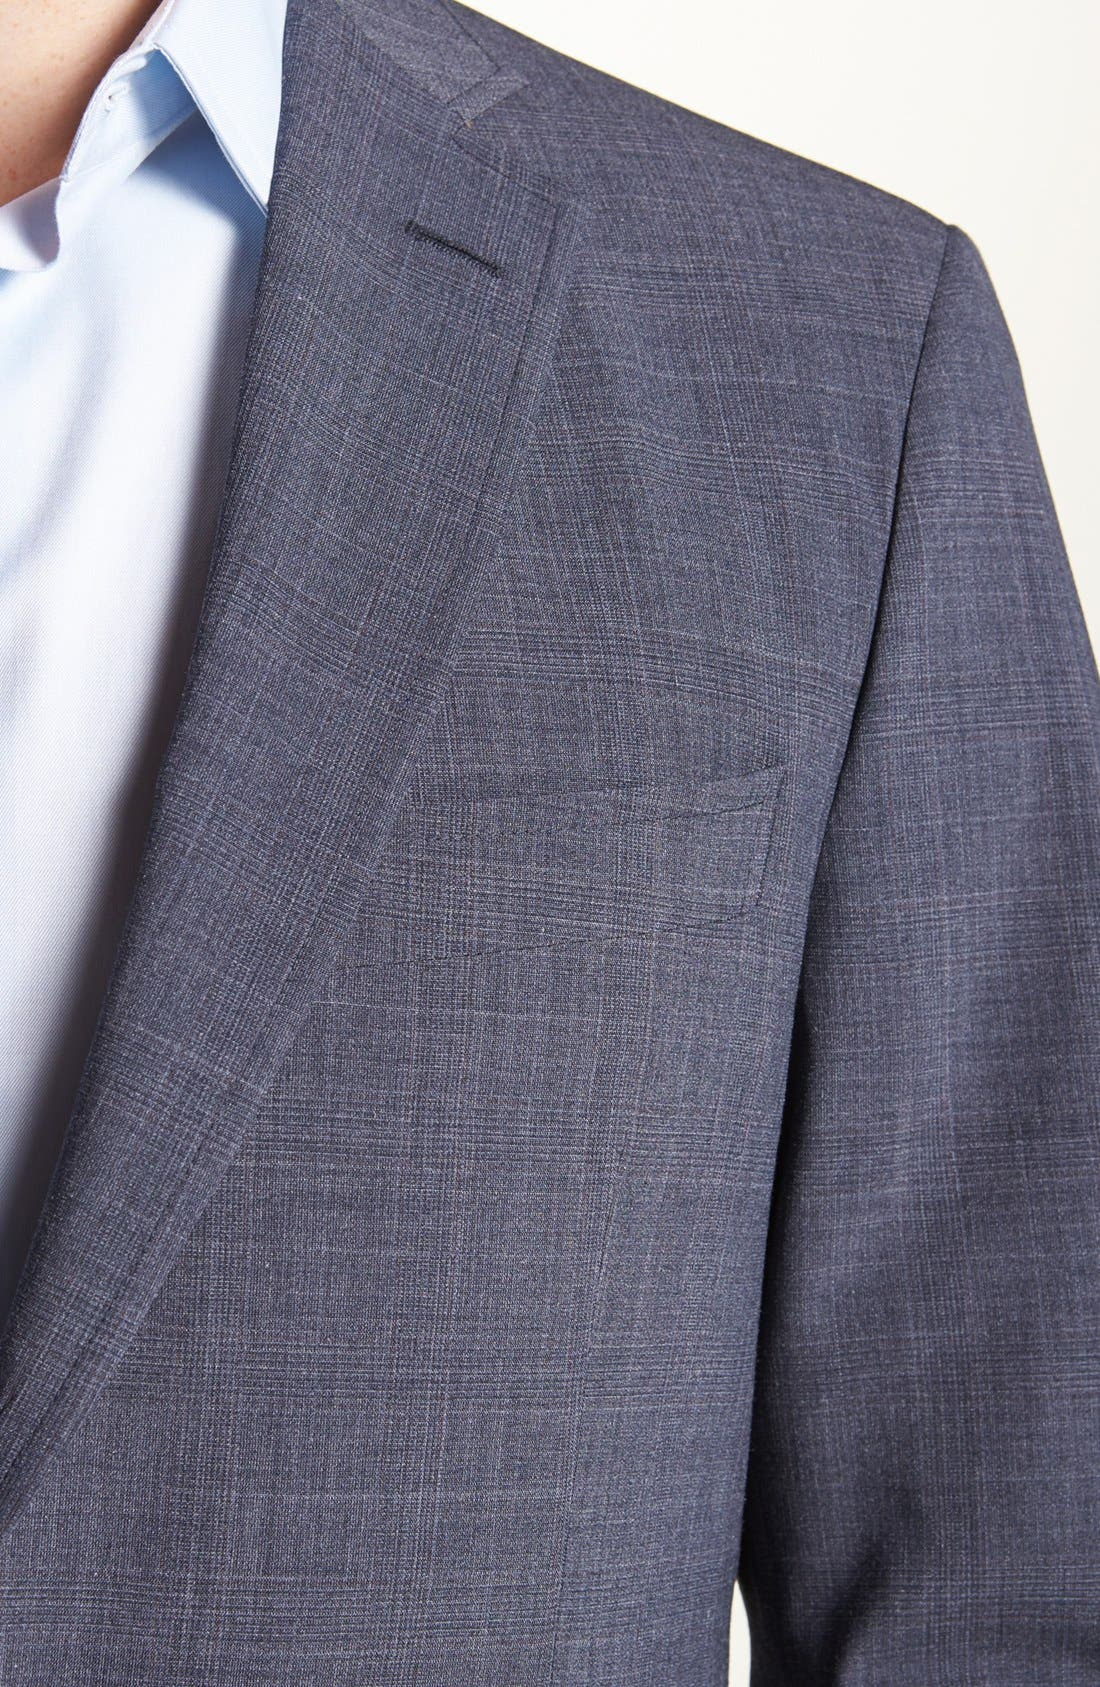 Alternate Image 5  - Billy Reid 'Campbell' Glen Plaid Wool Suit